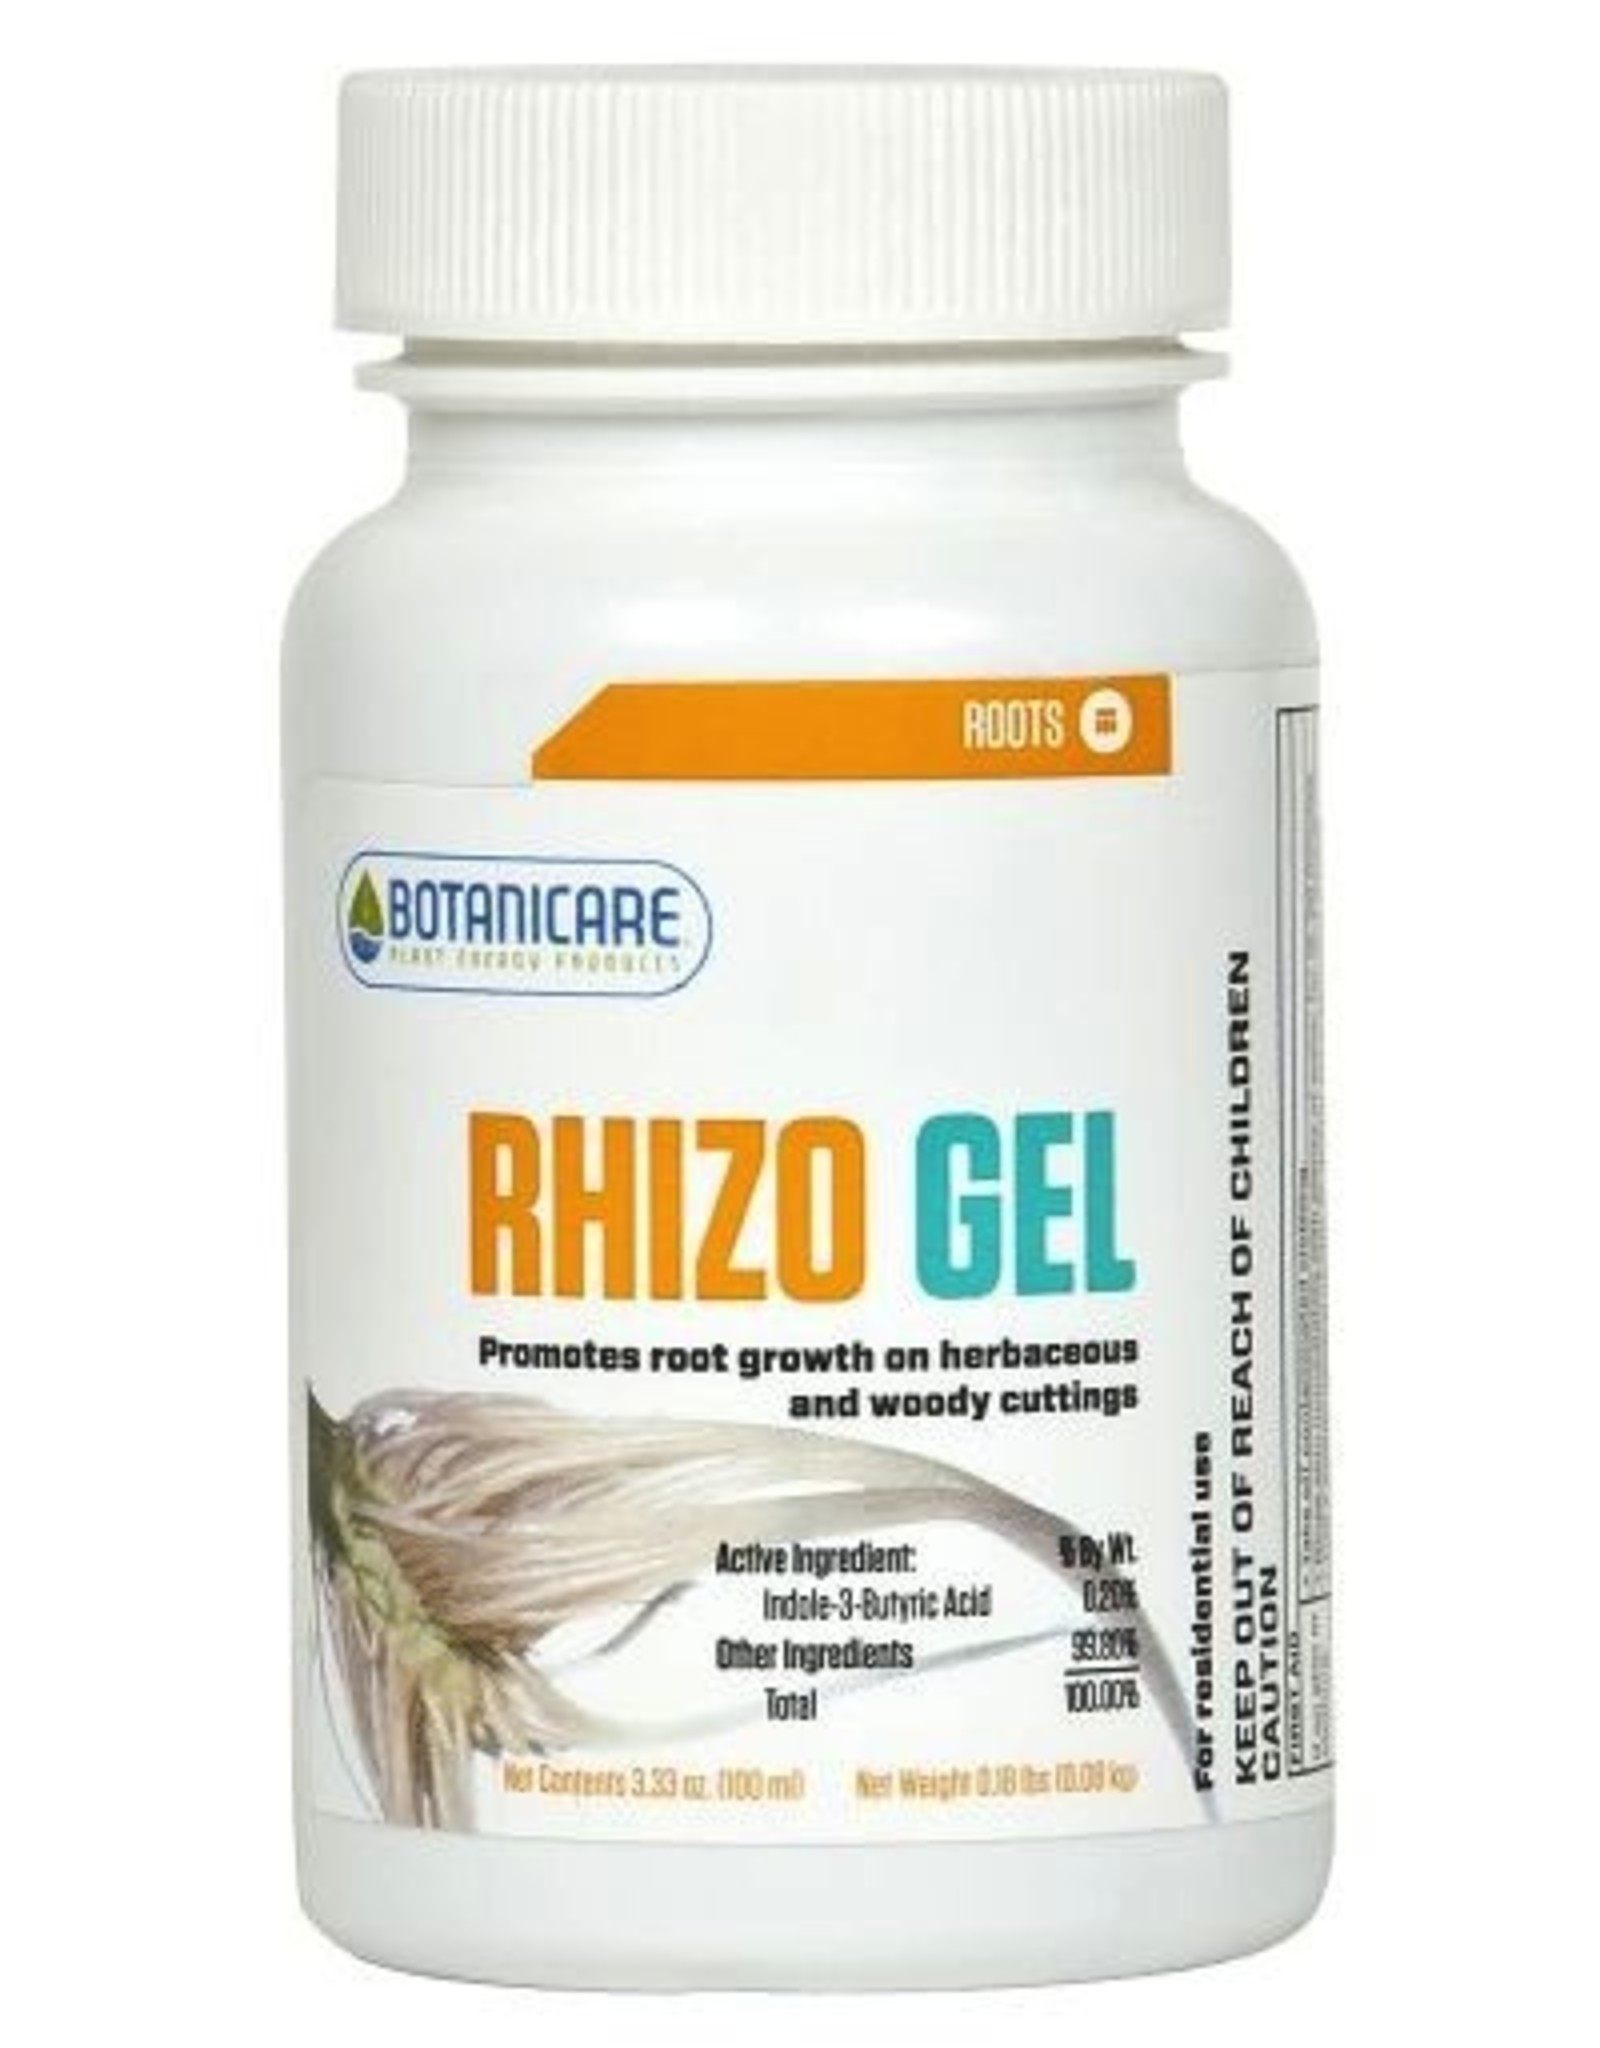 BOTANICARE Rhizo Gel 100 ml